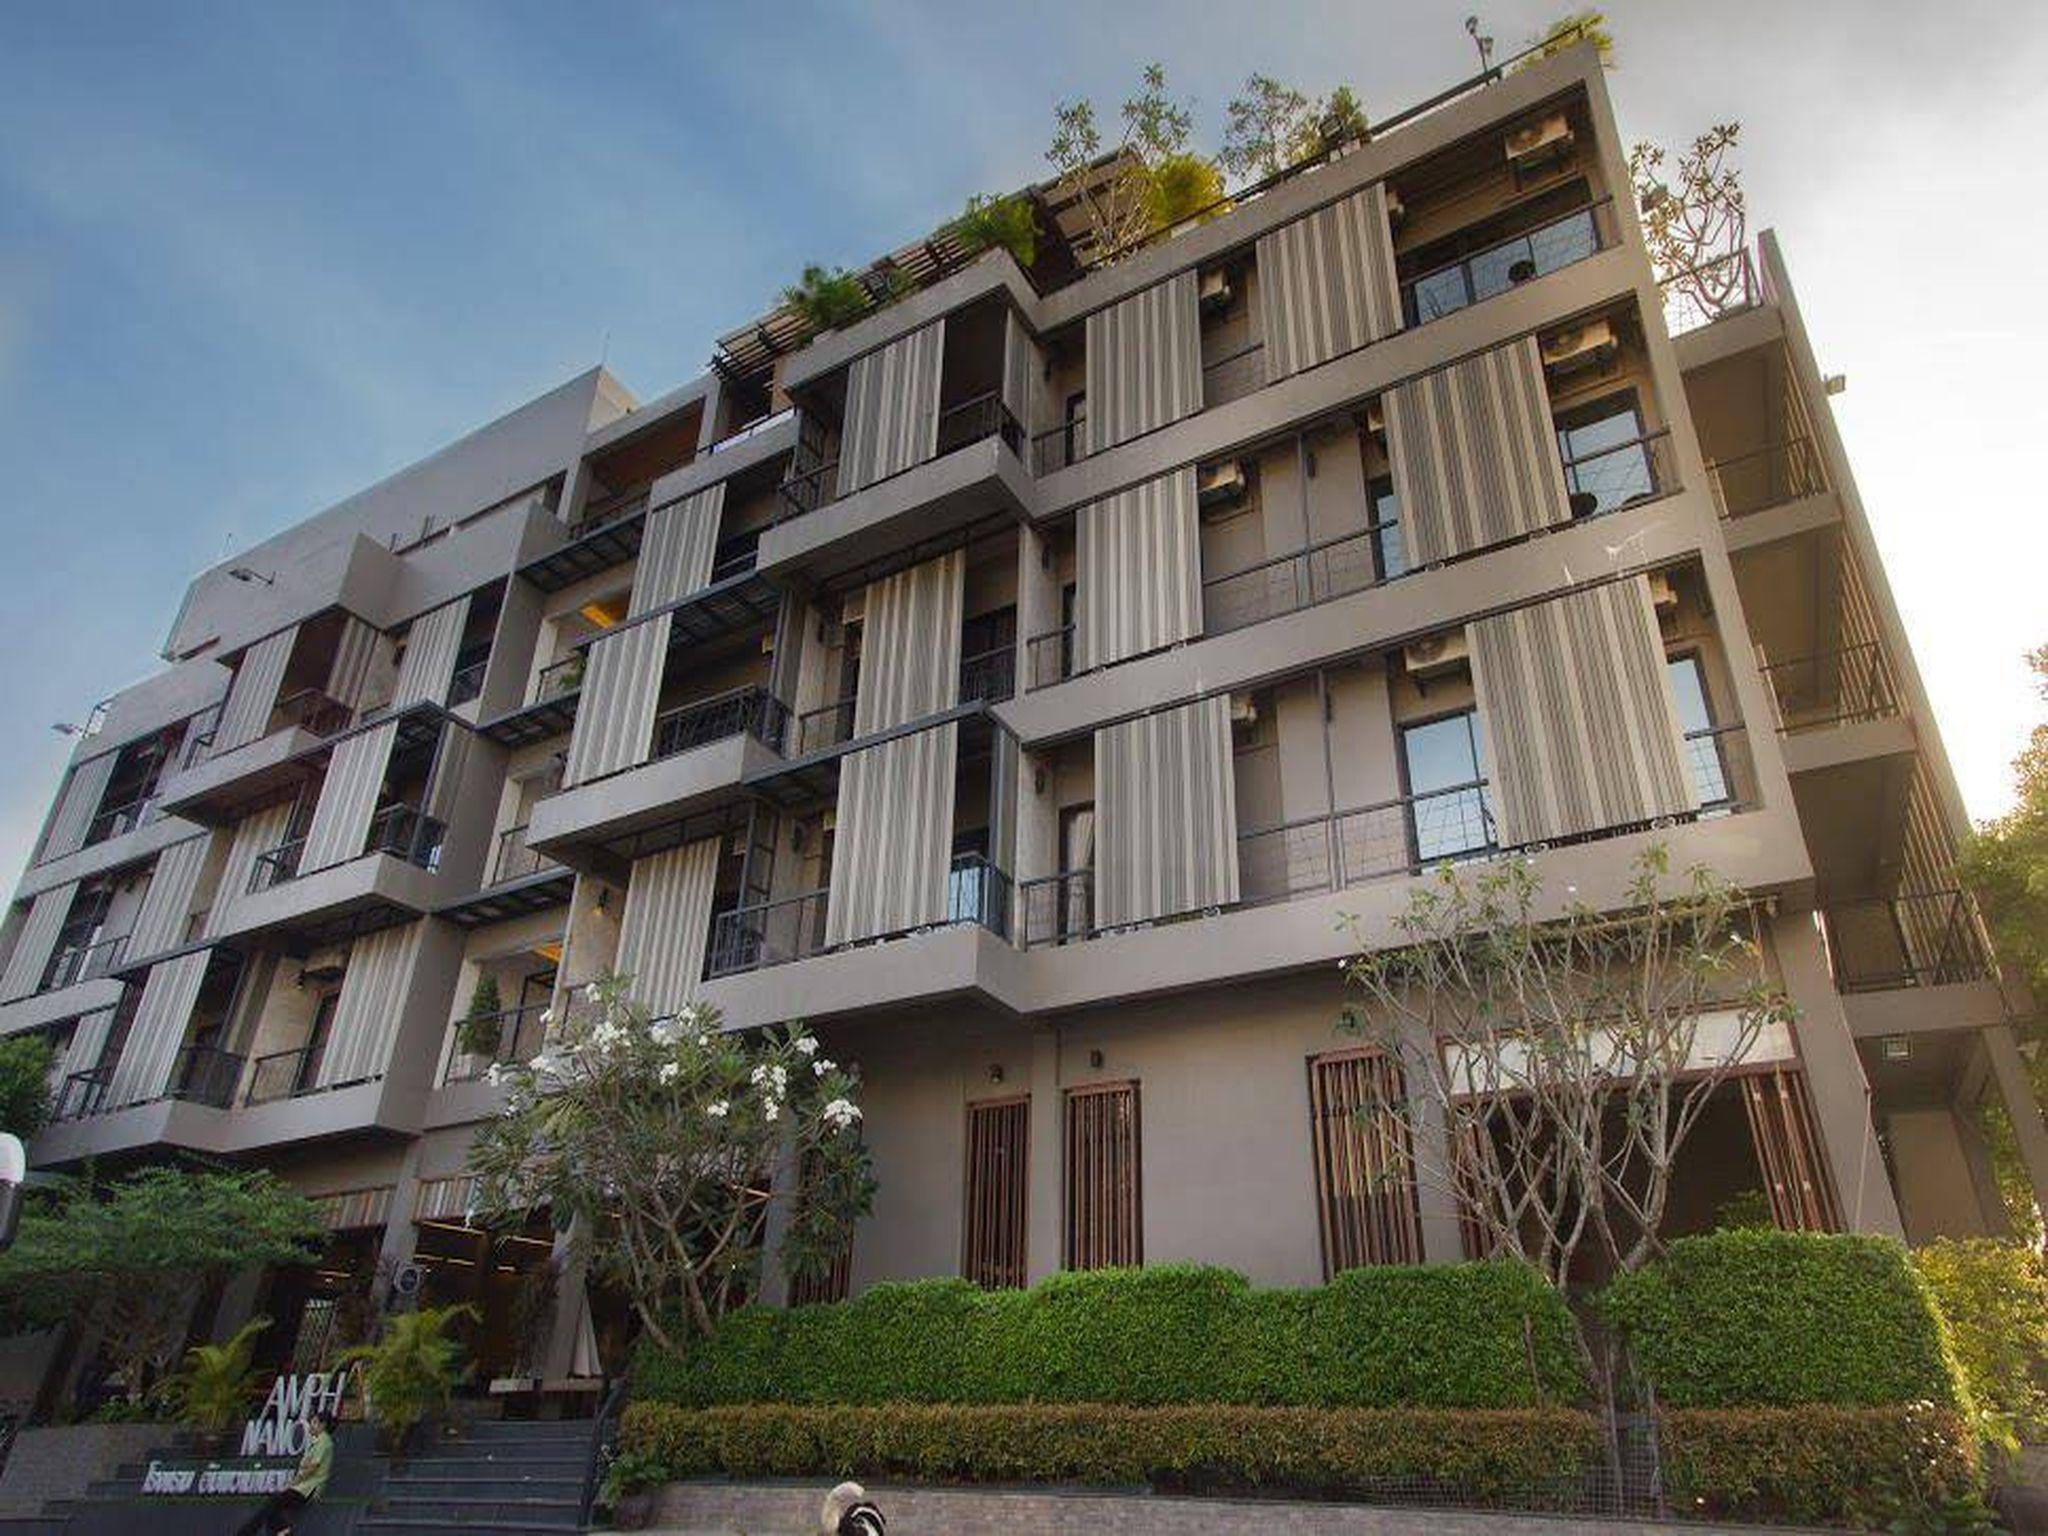 Hotel Zollina Villa. Hi-end. Luxury 4BR villa. Seminyak - Jl. Pengipian No.33, Kerobokan Kelod, Kuta Utara, Kabupaten Badung, Bali 80361, Indonesia - Bali